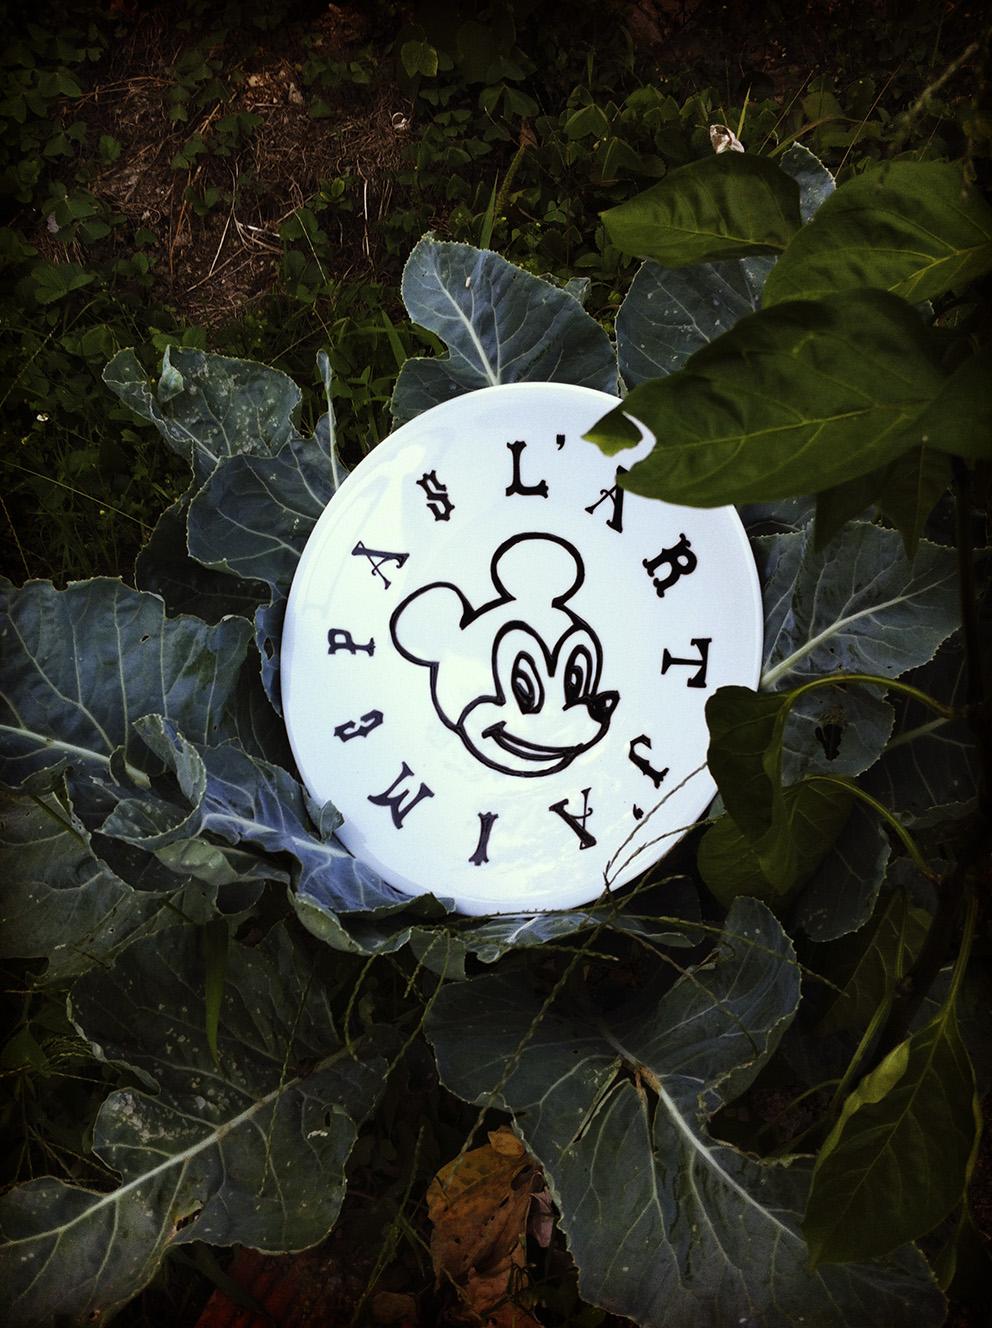 J'aime Pas L'art by Deluna Ceramics